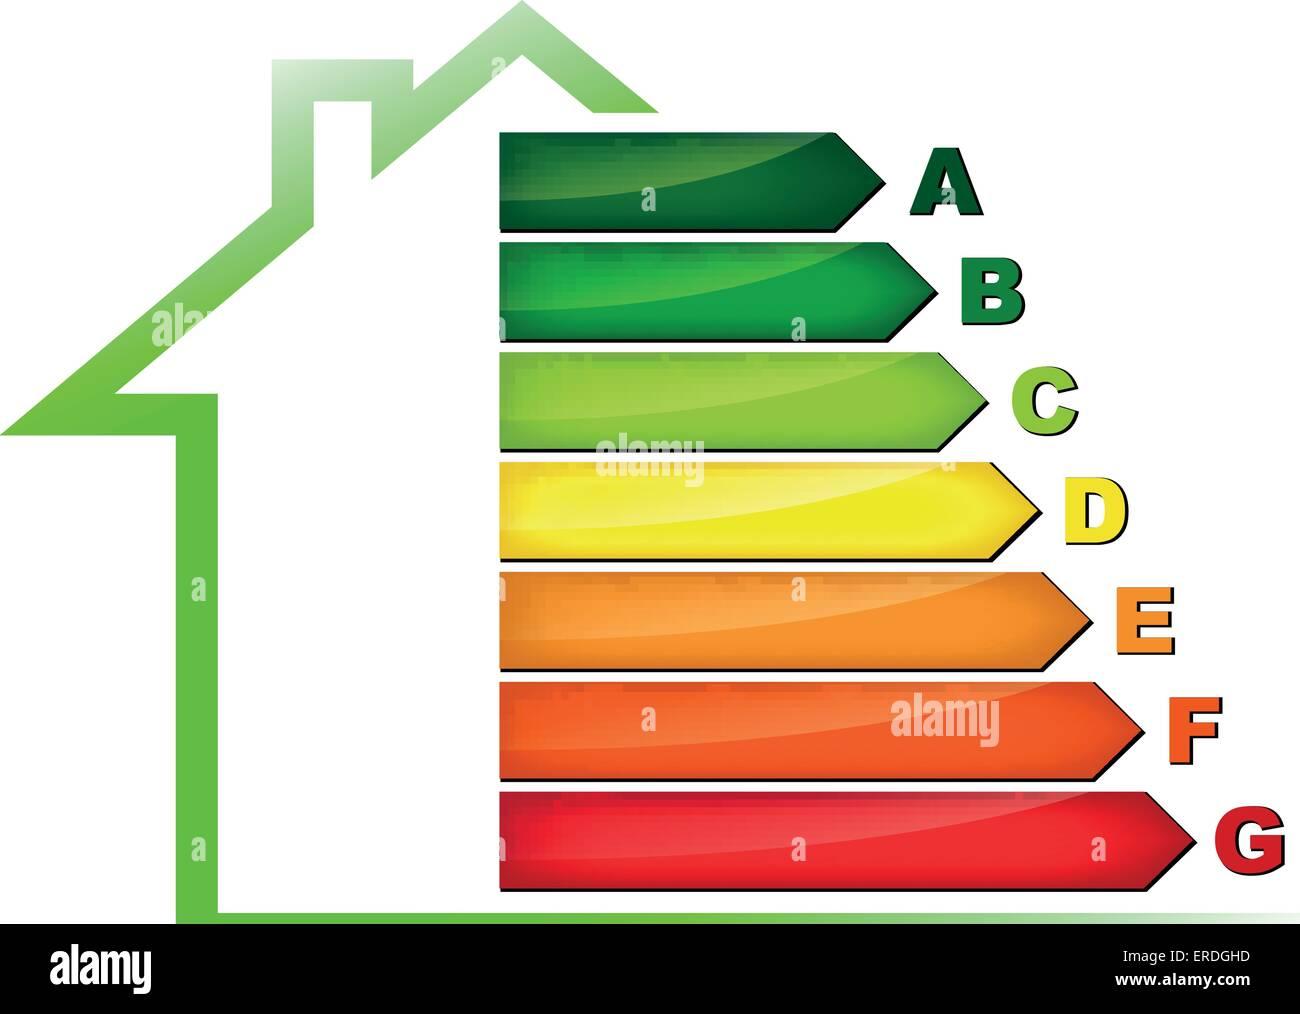 Vector illustration of energy efficiency symbol on white vector illustration of energy efficiency symbol on white background buycottarizona